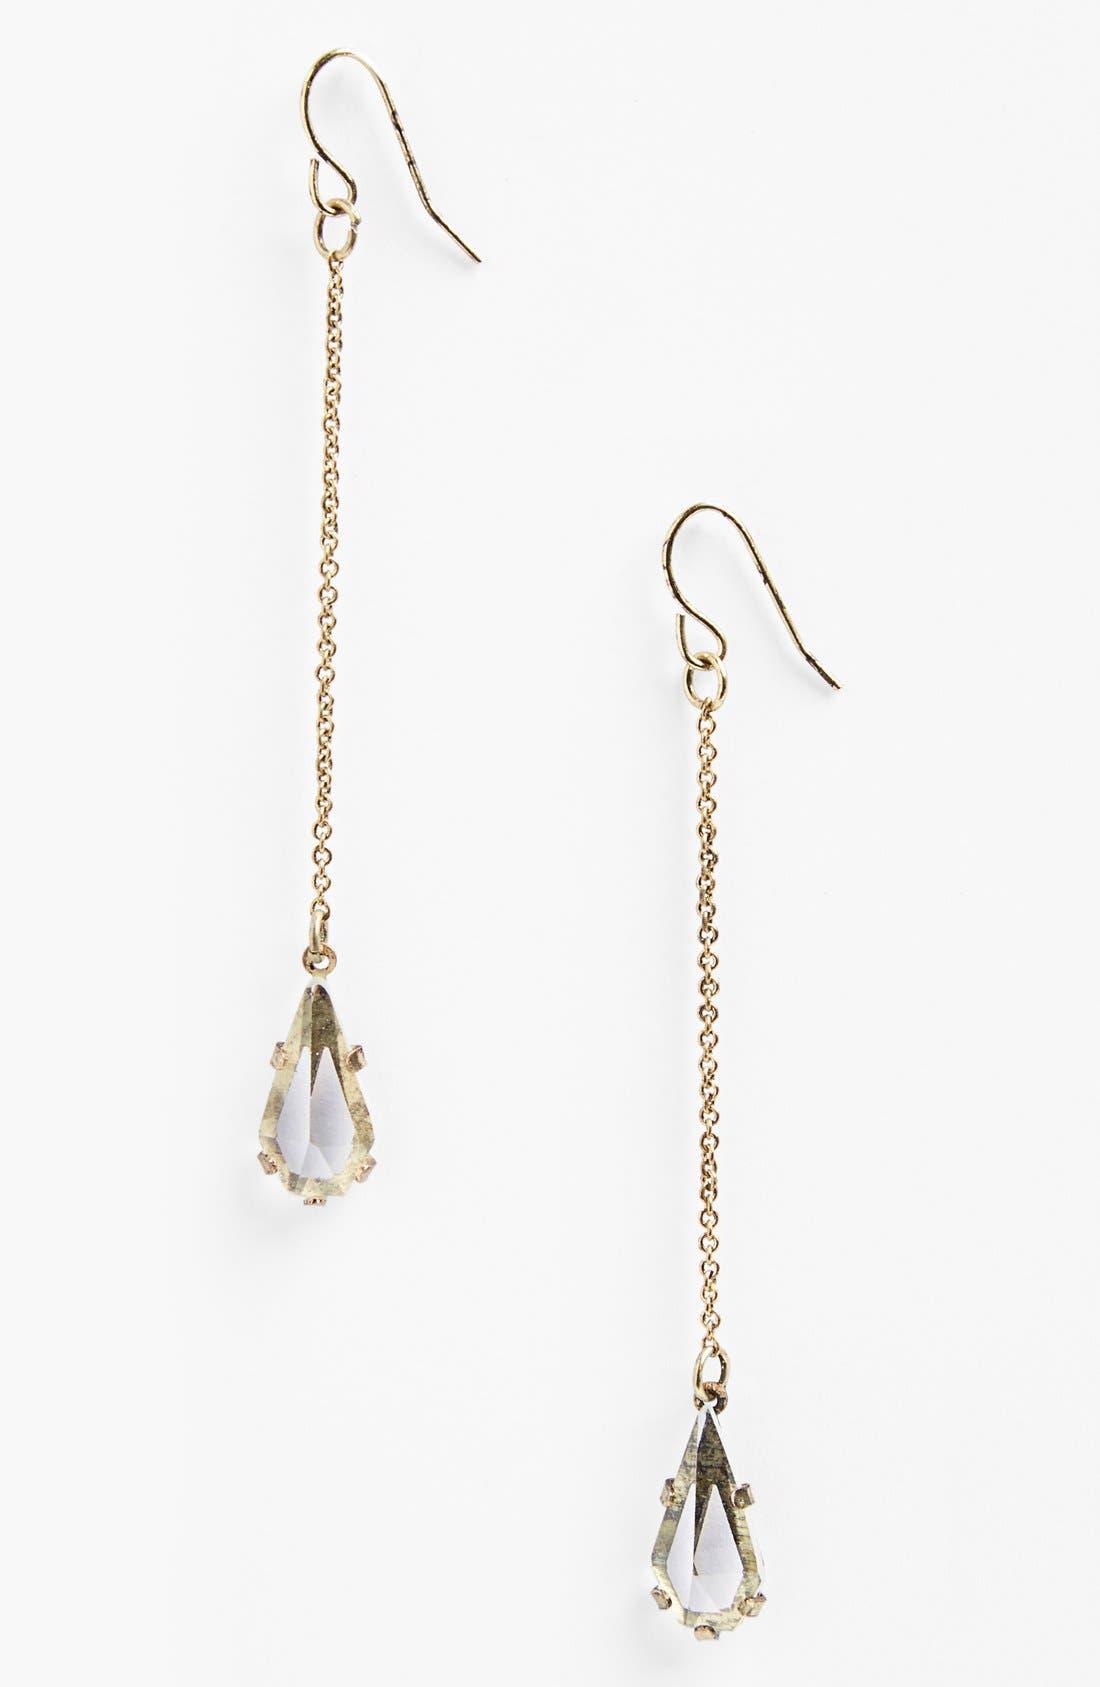 Alternate Image 1 Selected - Missing Piece 'Delicate' Drop Earrings